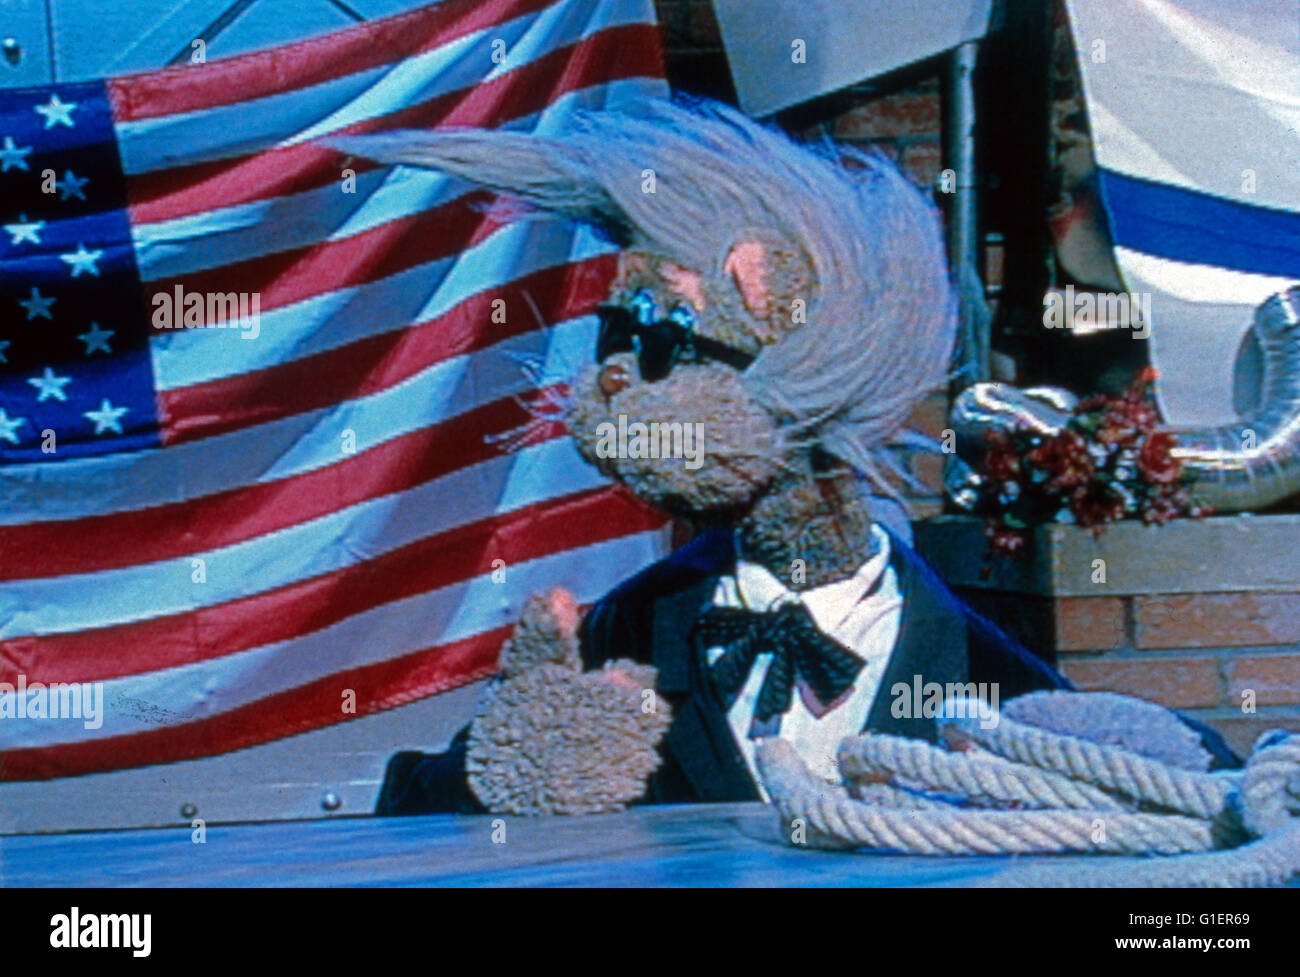 Bim Bam Microscópios binoculares, Kinderfernsehserie, Deutschland 1988 - 1998, Katze Lucy als Leningrad Cowboys Imagens de Stock